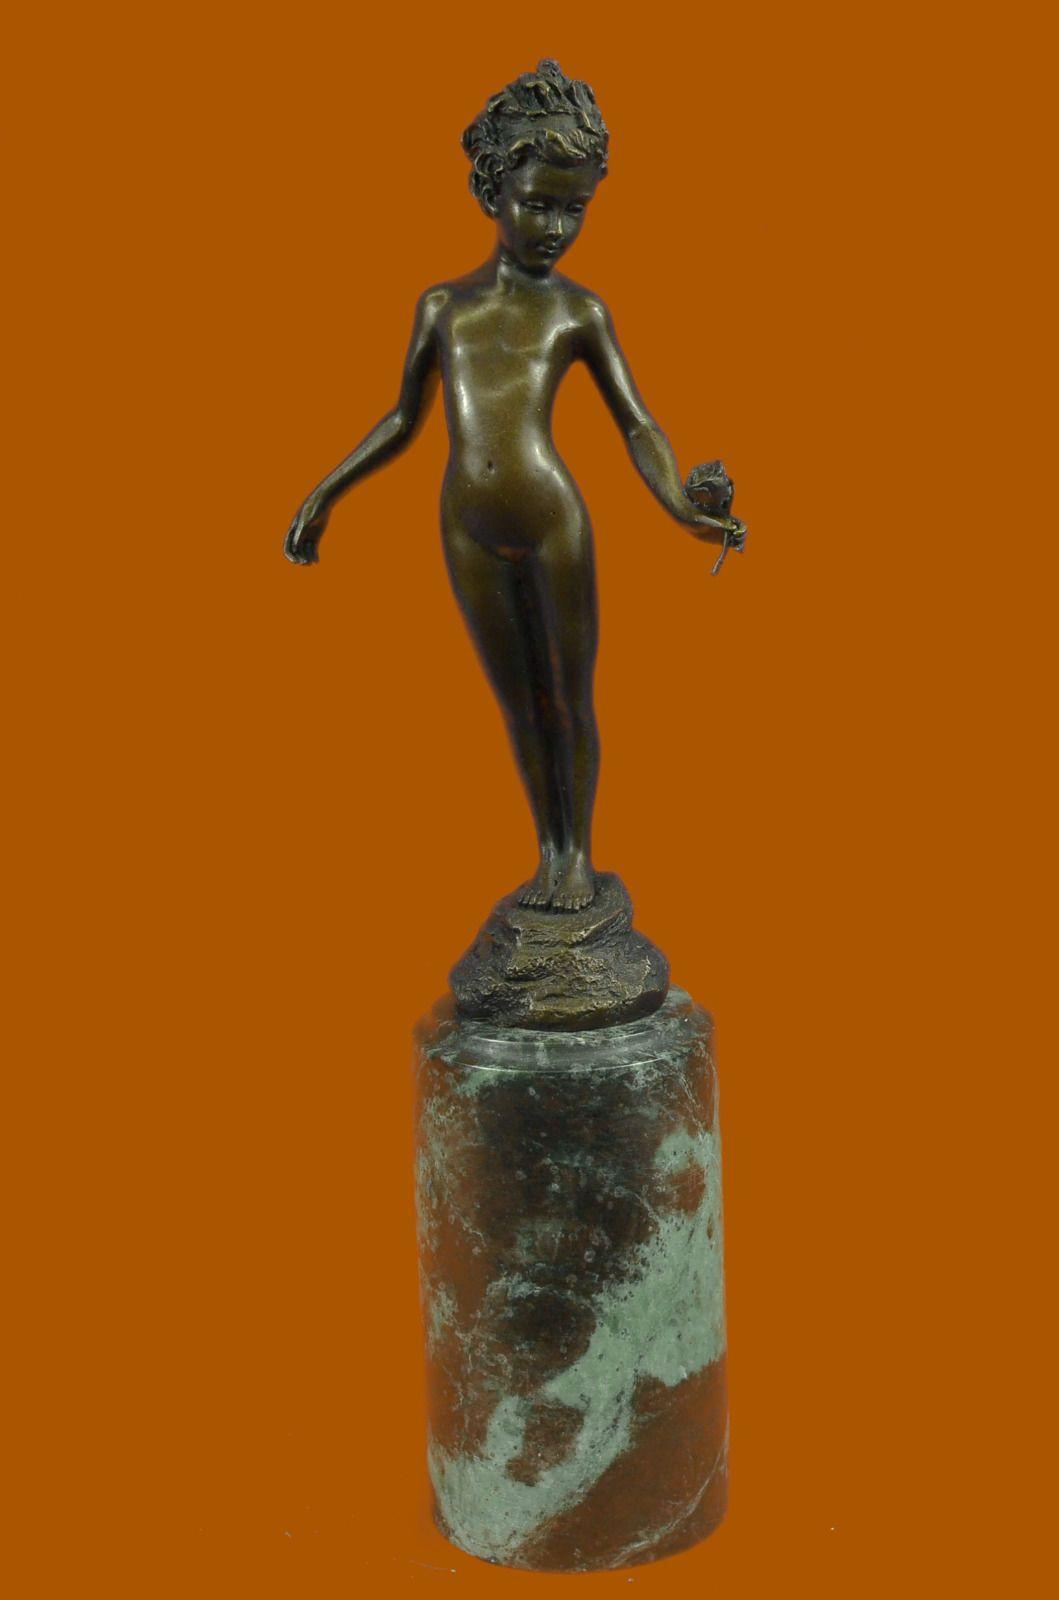 Art Nouveau Gilt Bronze Sculpture of a Young Girl Nude by